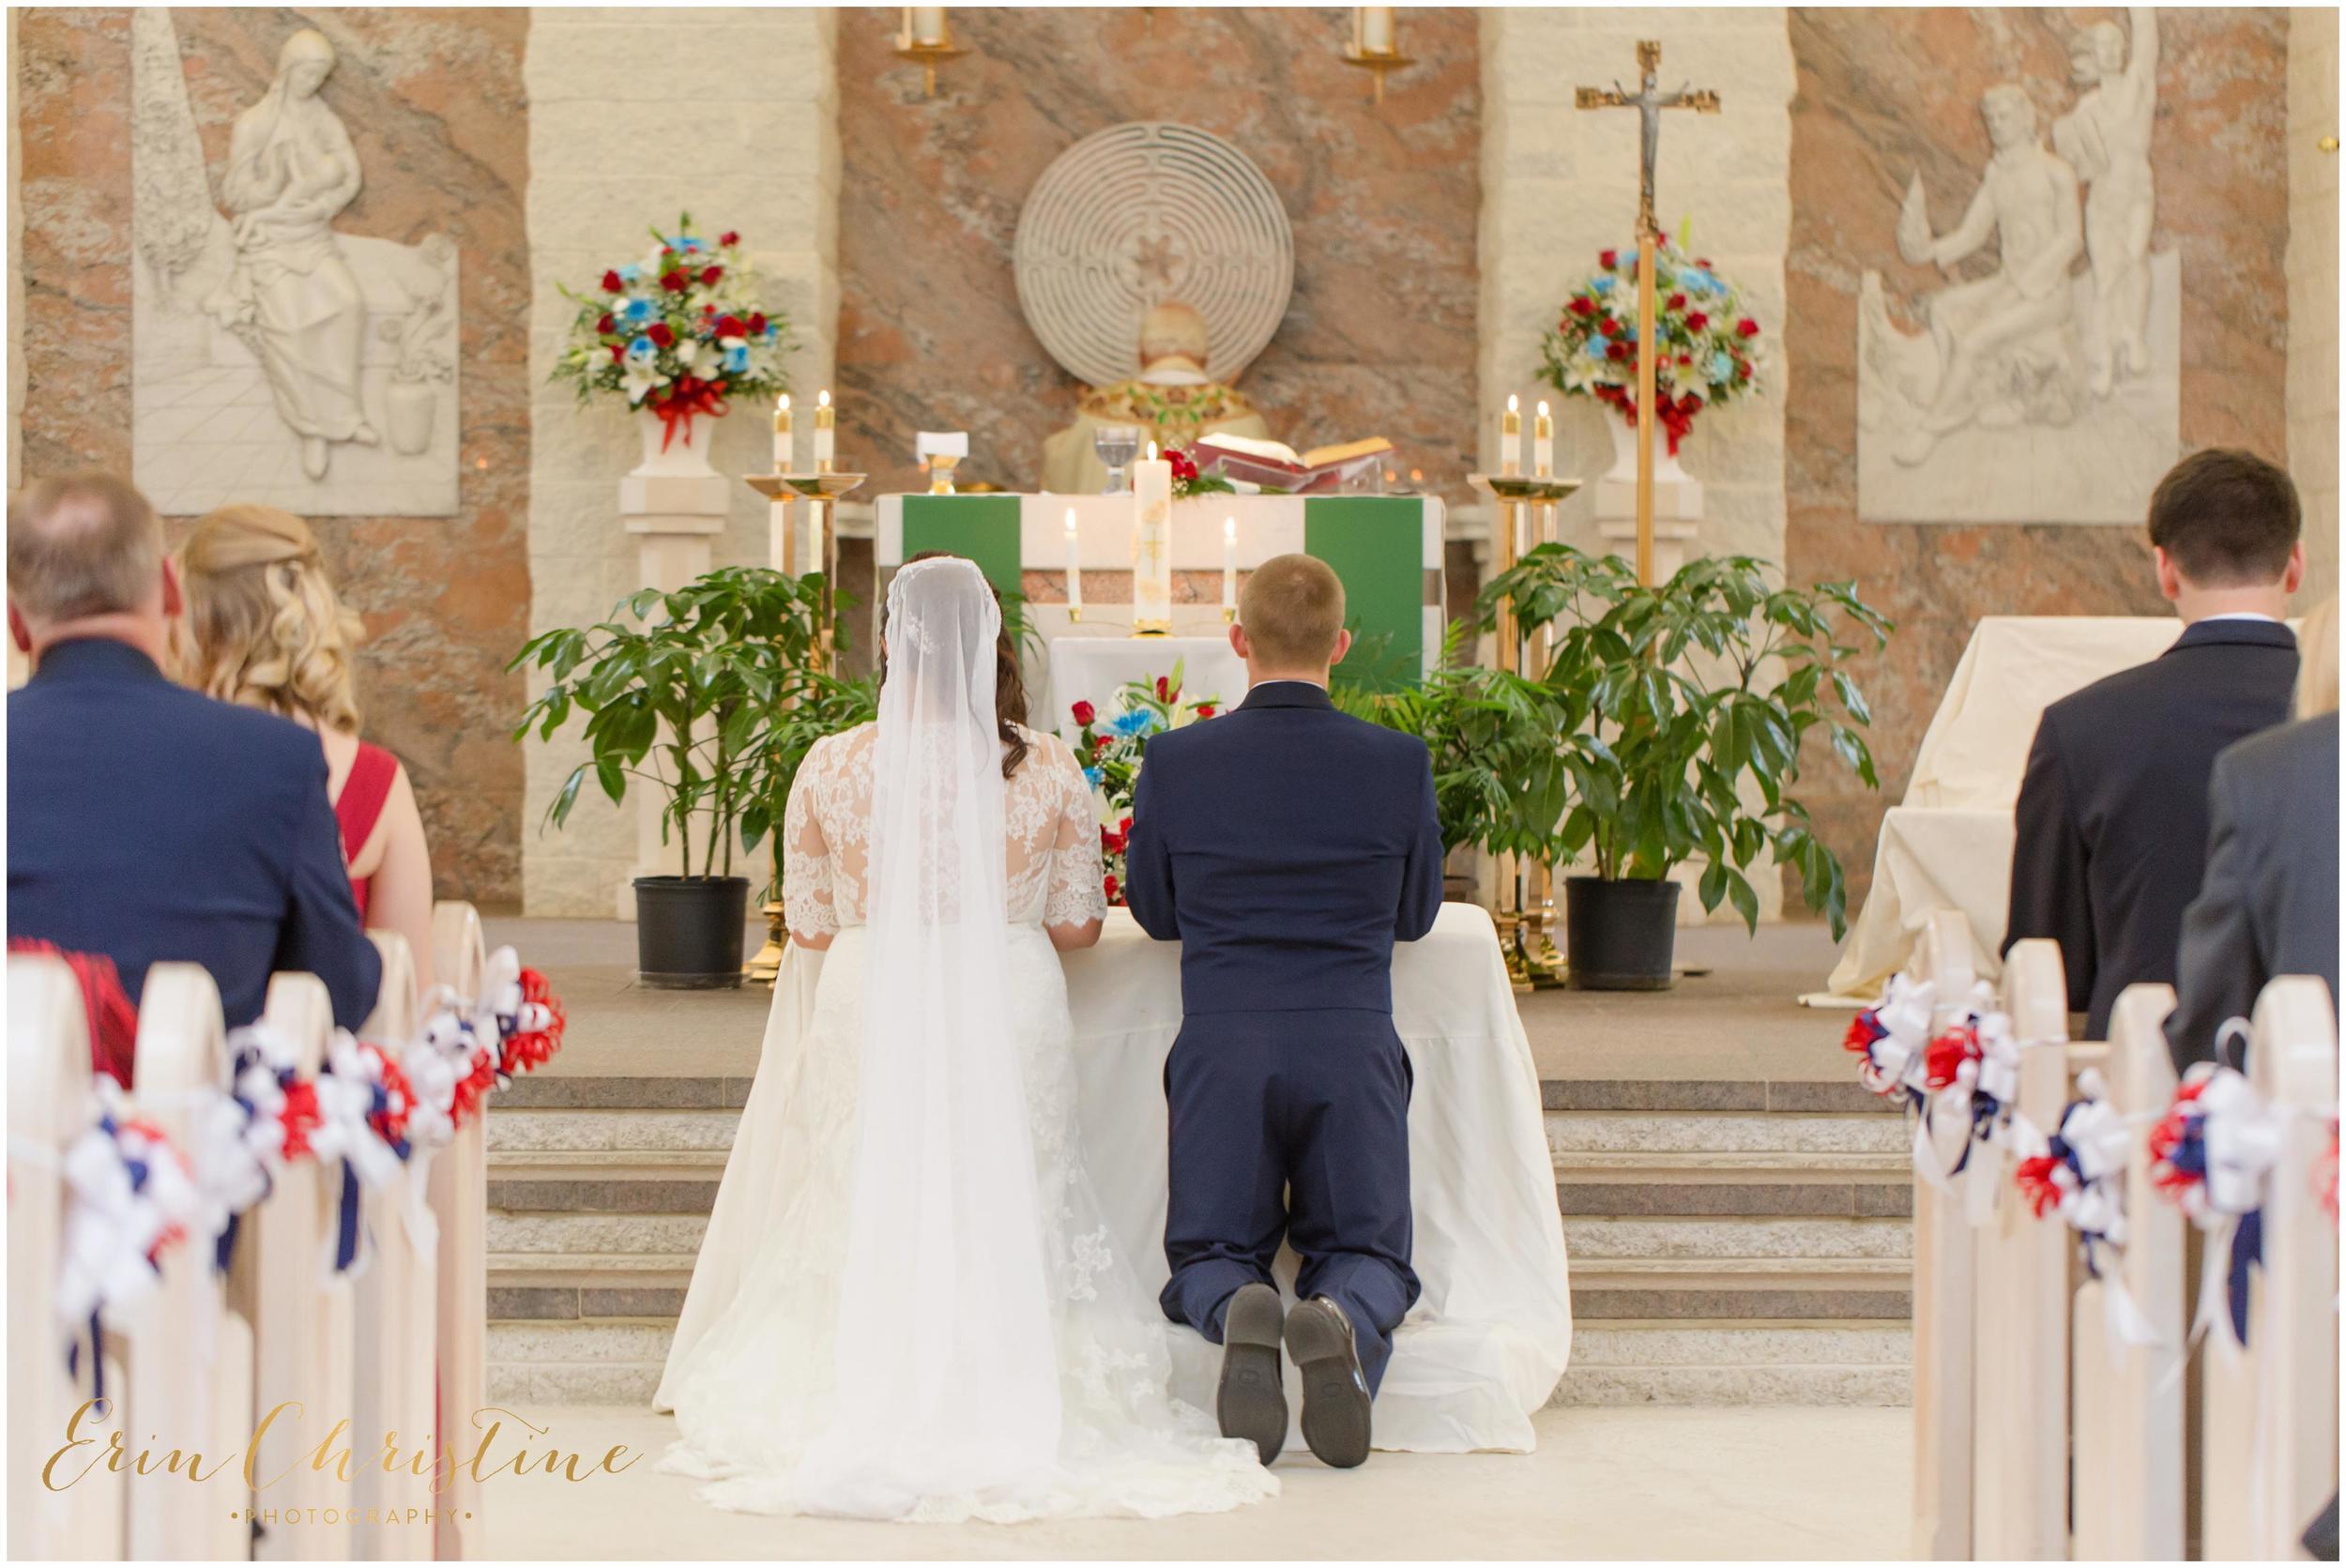 Catholic Ceremony Jesus The Good Shephered-9149.jpg